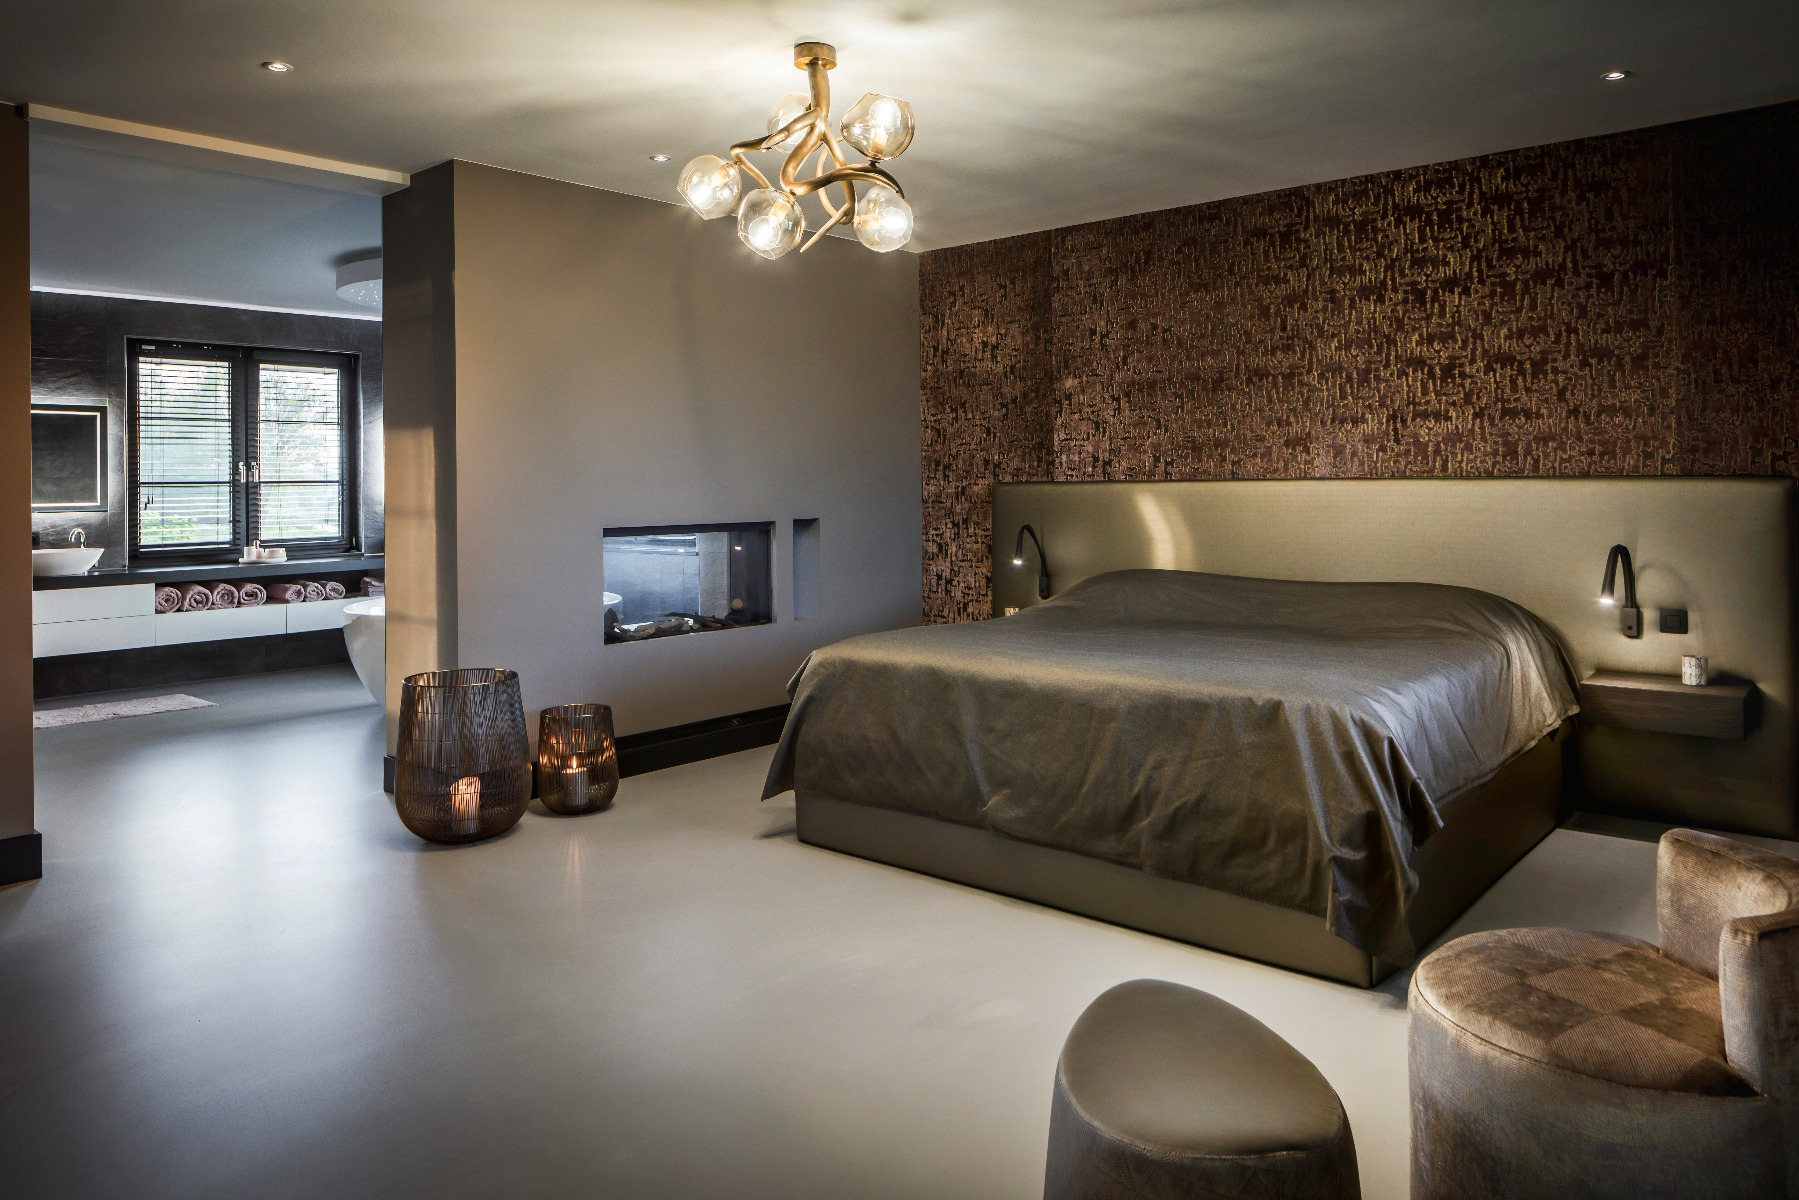 Residence, Rotterdam, The Netherlands, caribou